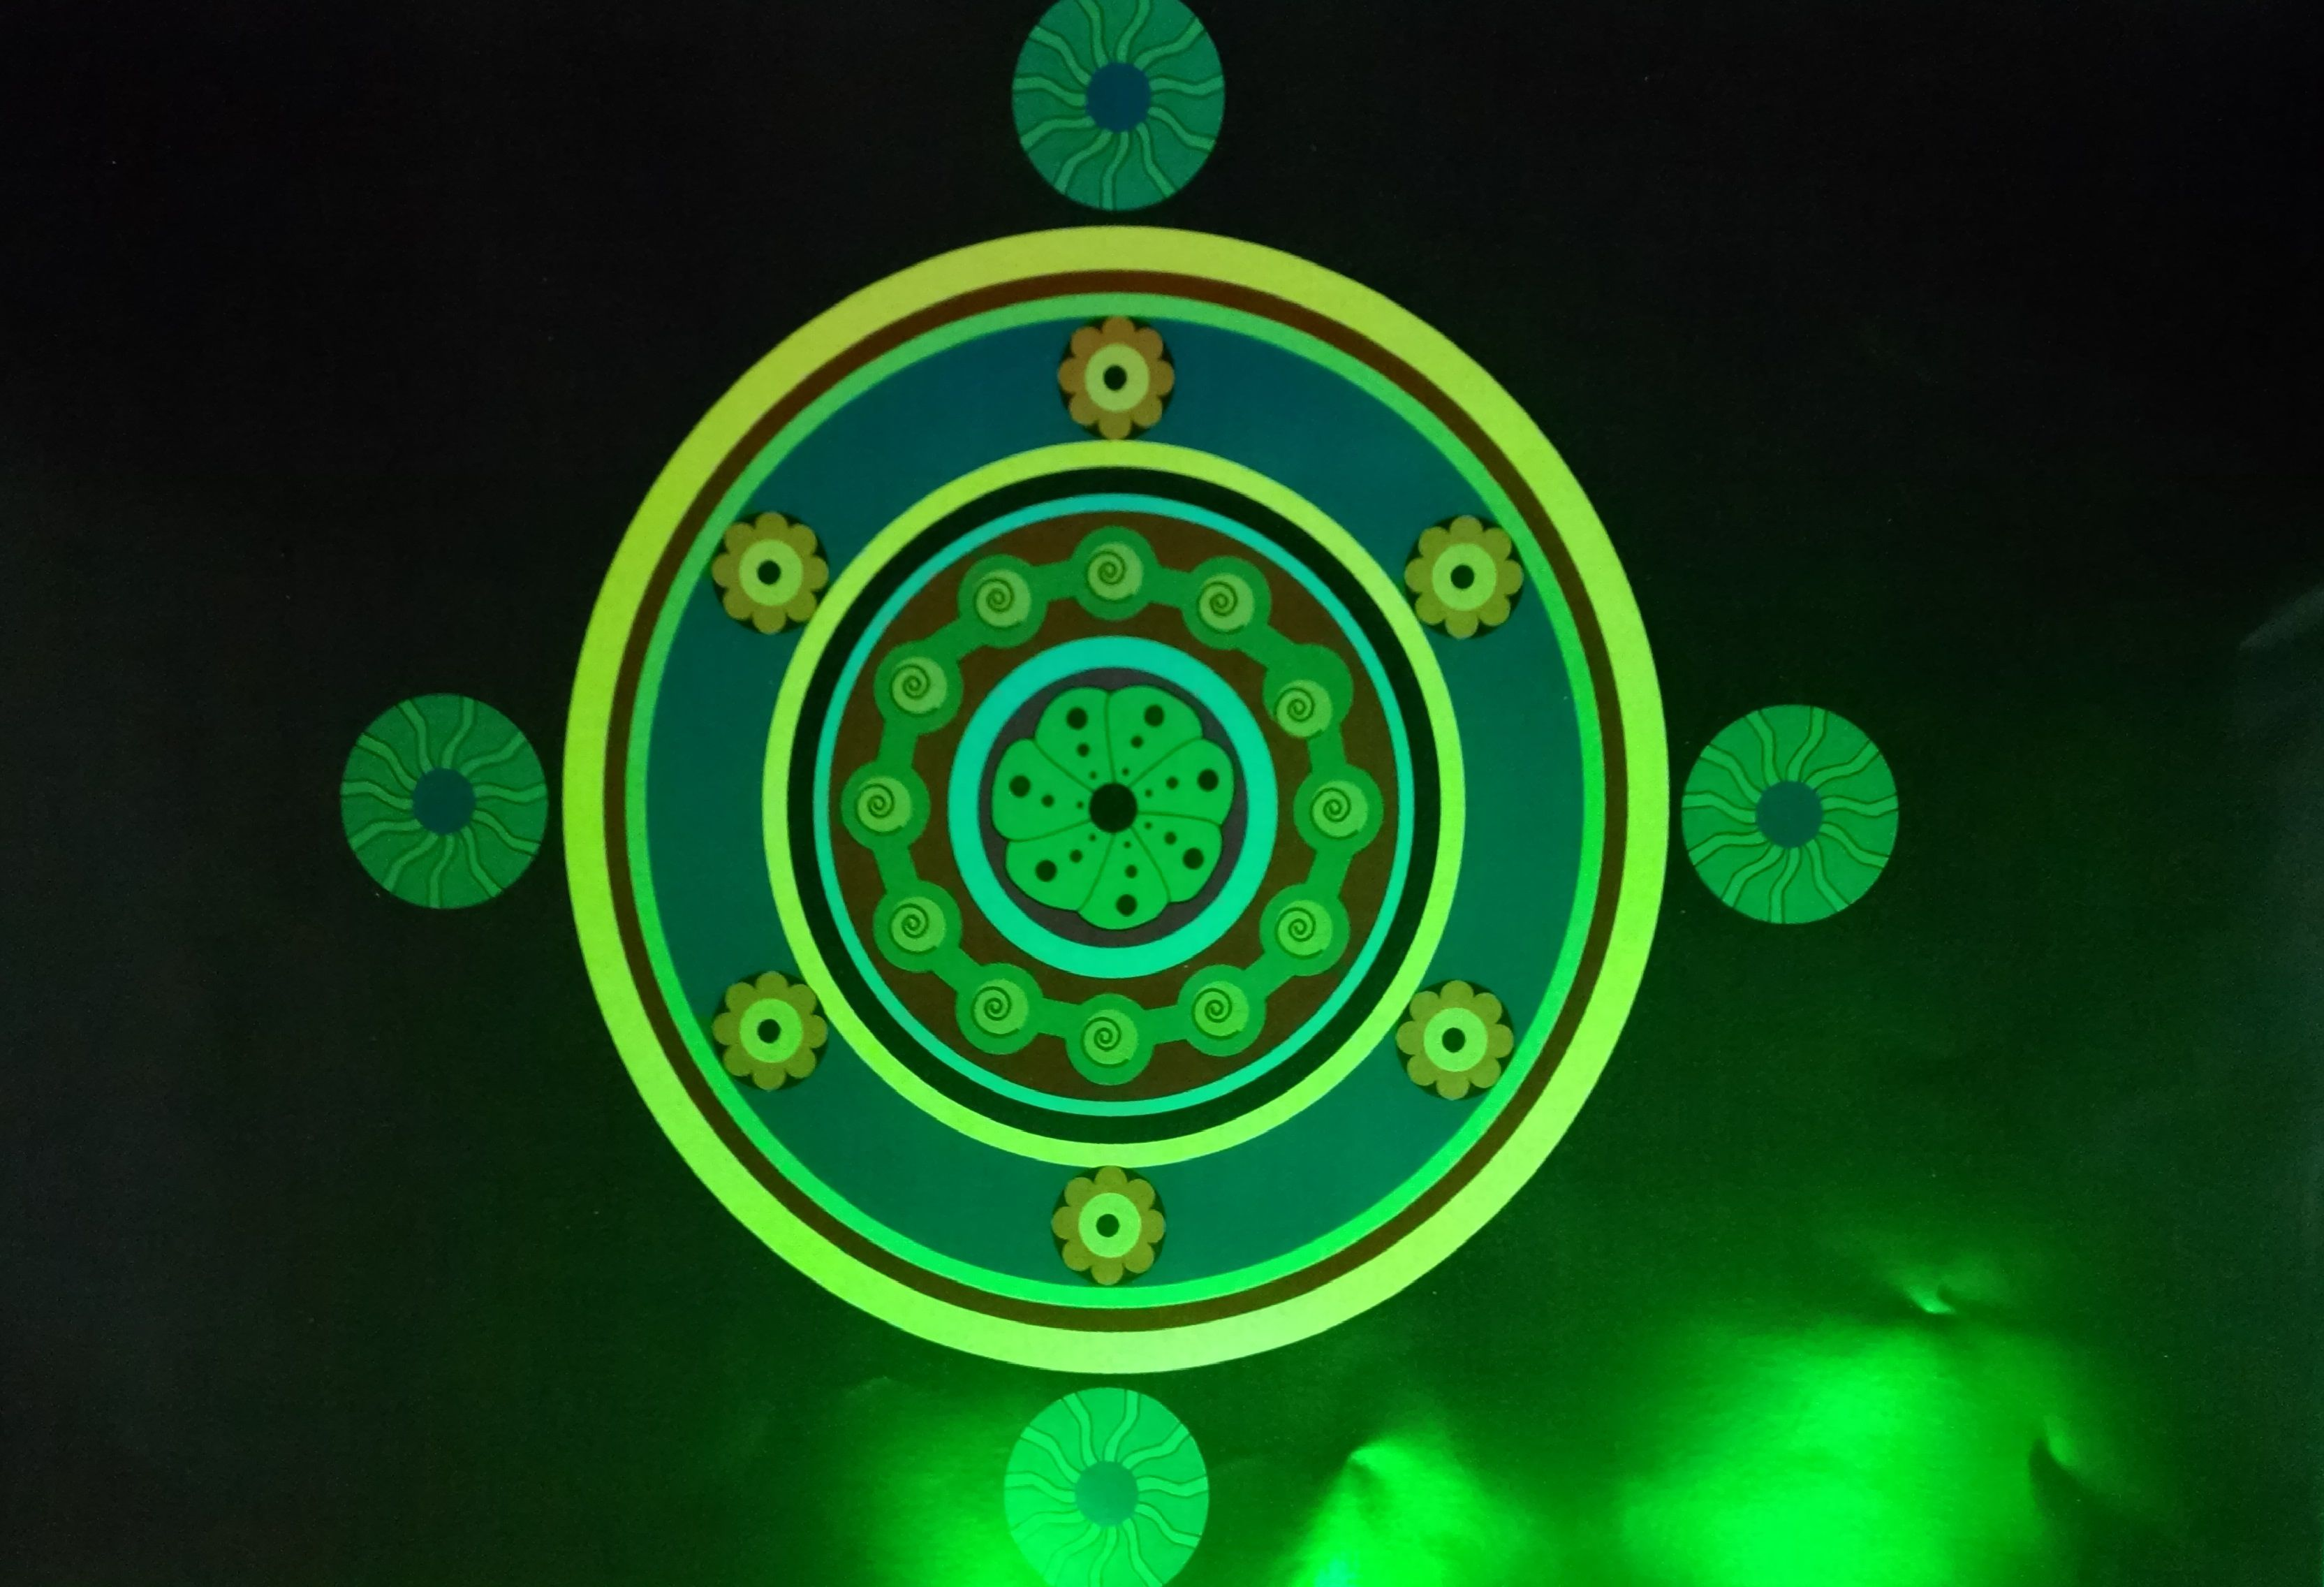 Luz Verde Disenos De Unas Luces Verdes Asignaturas